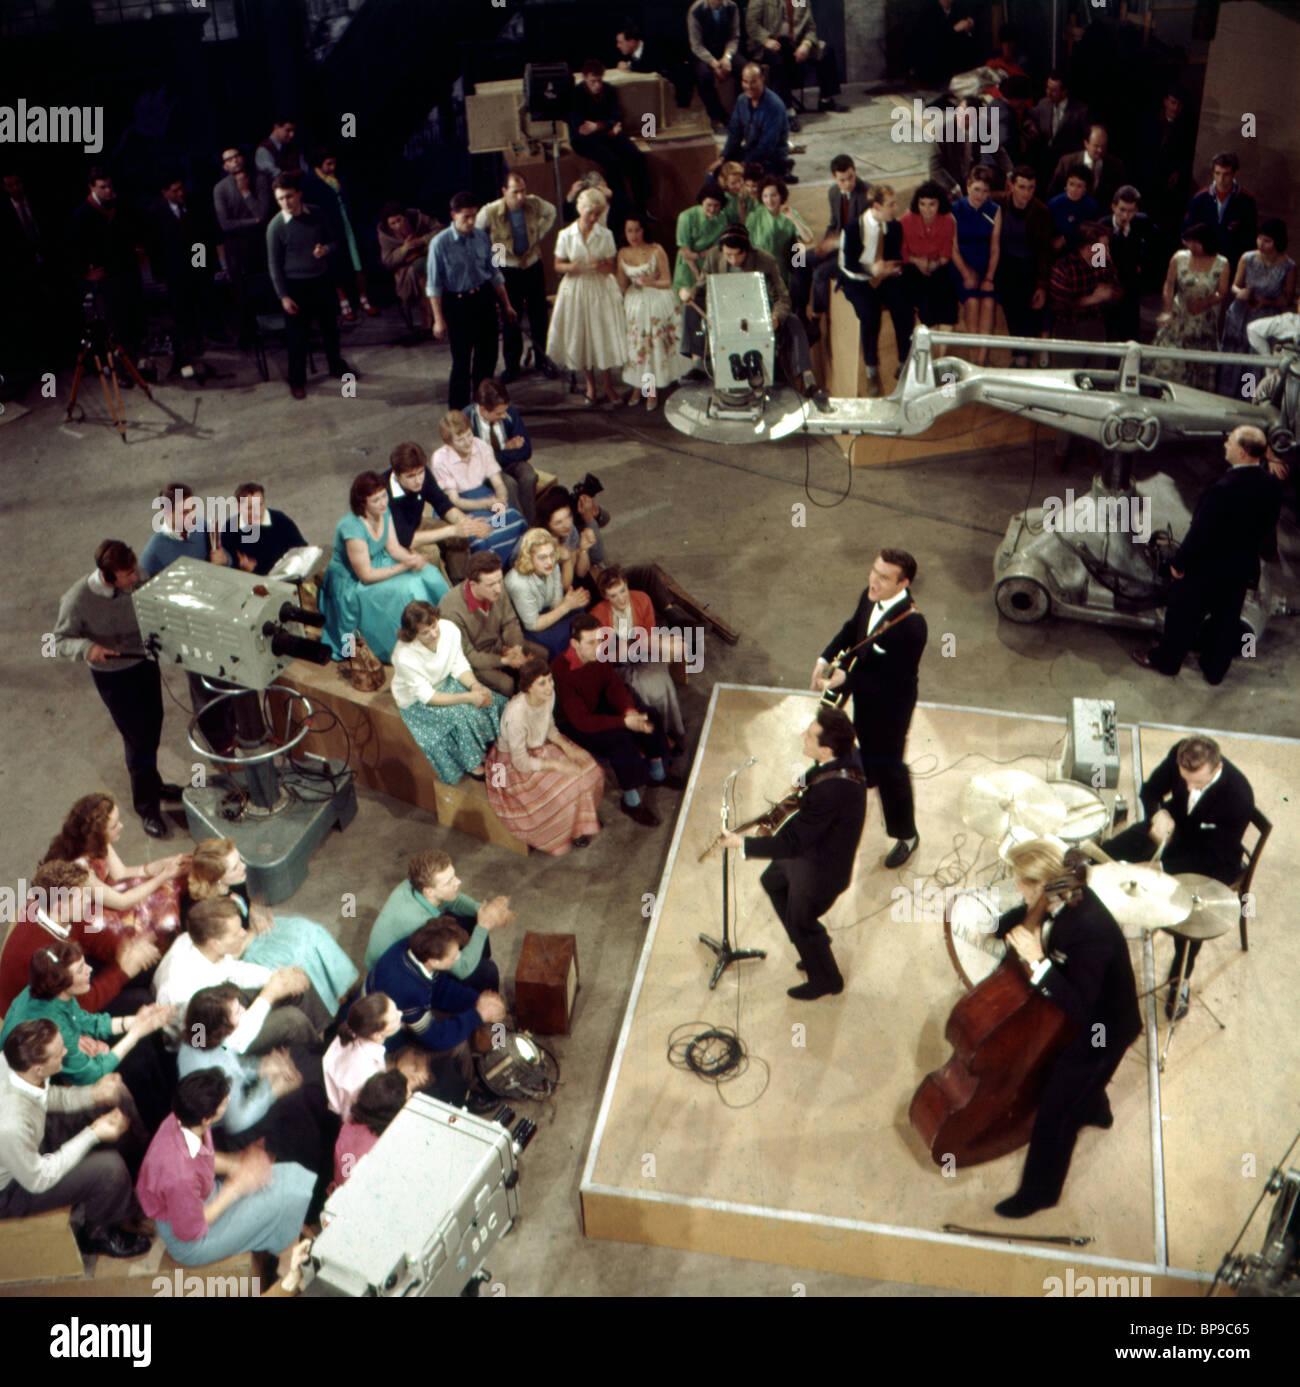 LONNIE DONEGAN THE LONDON PALLADIUM SHOW (1966) - Stock Image